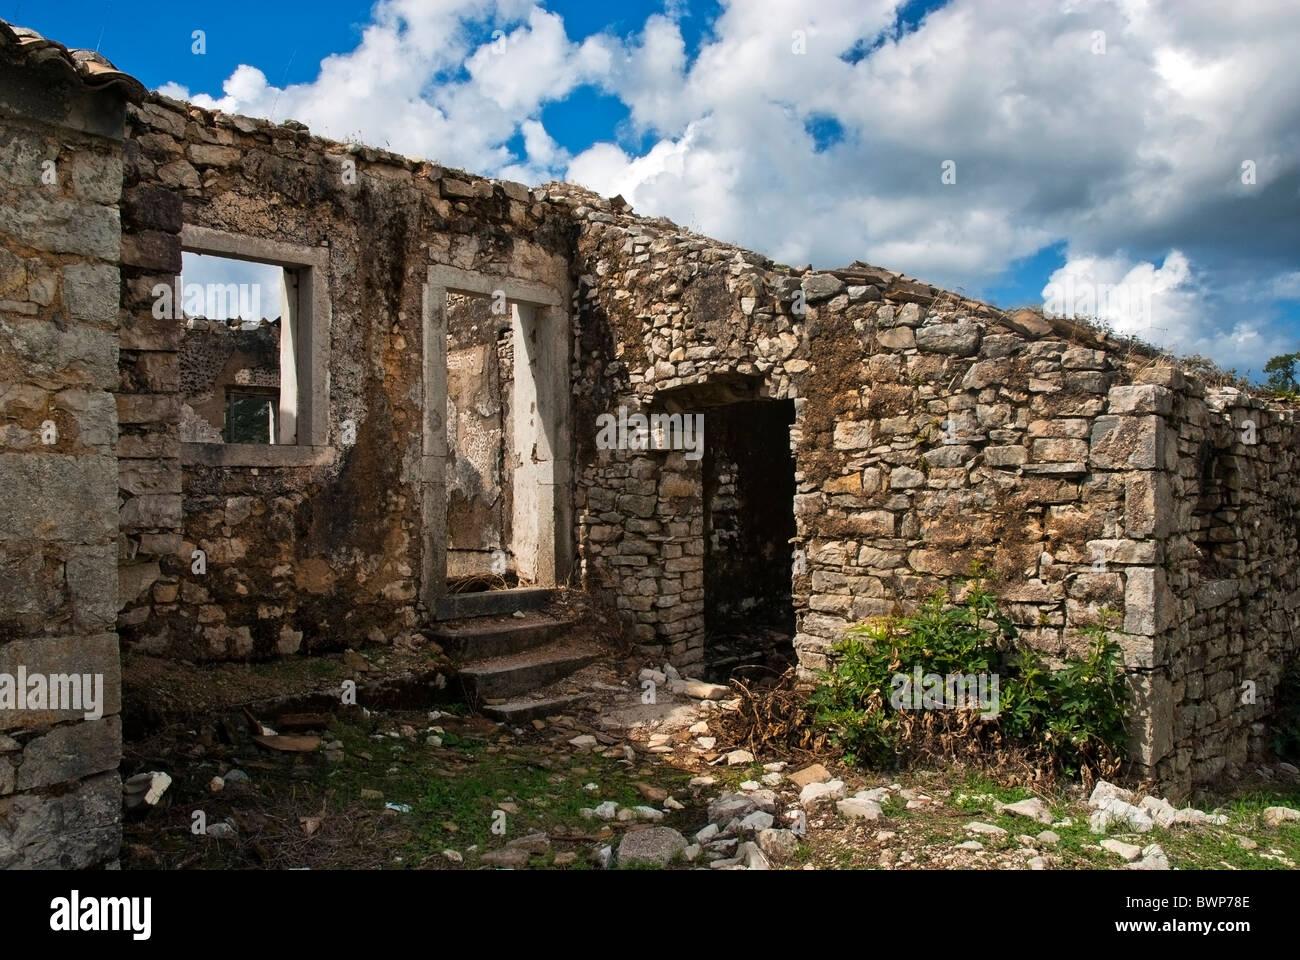 Derelict house in Old Perithia, Corfu, Ioninan Islands Greece. - Stock Image